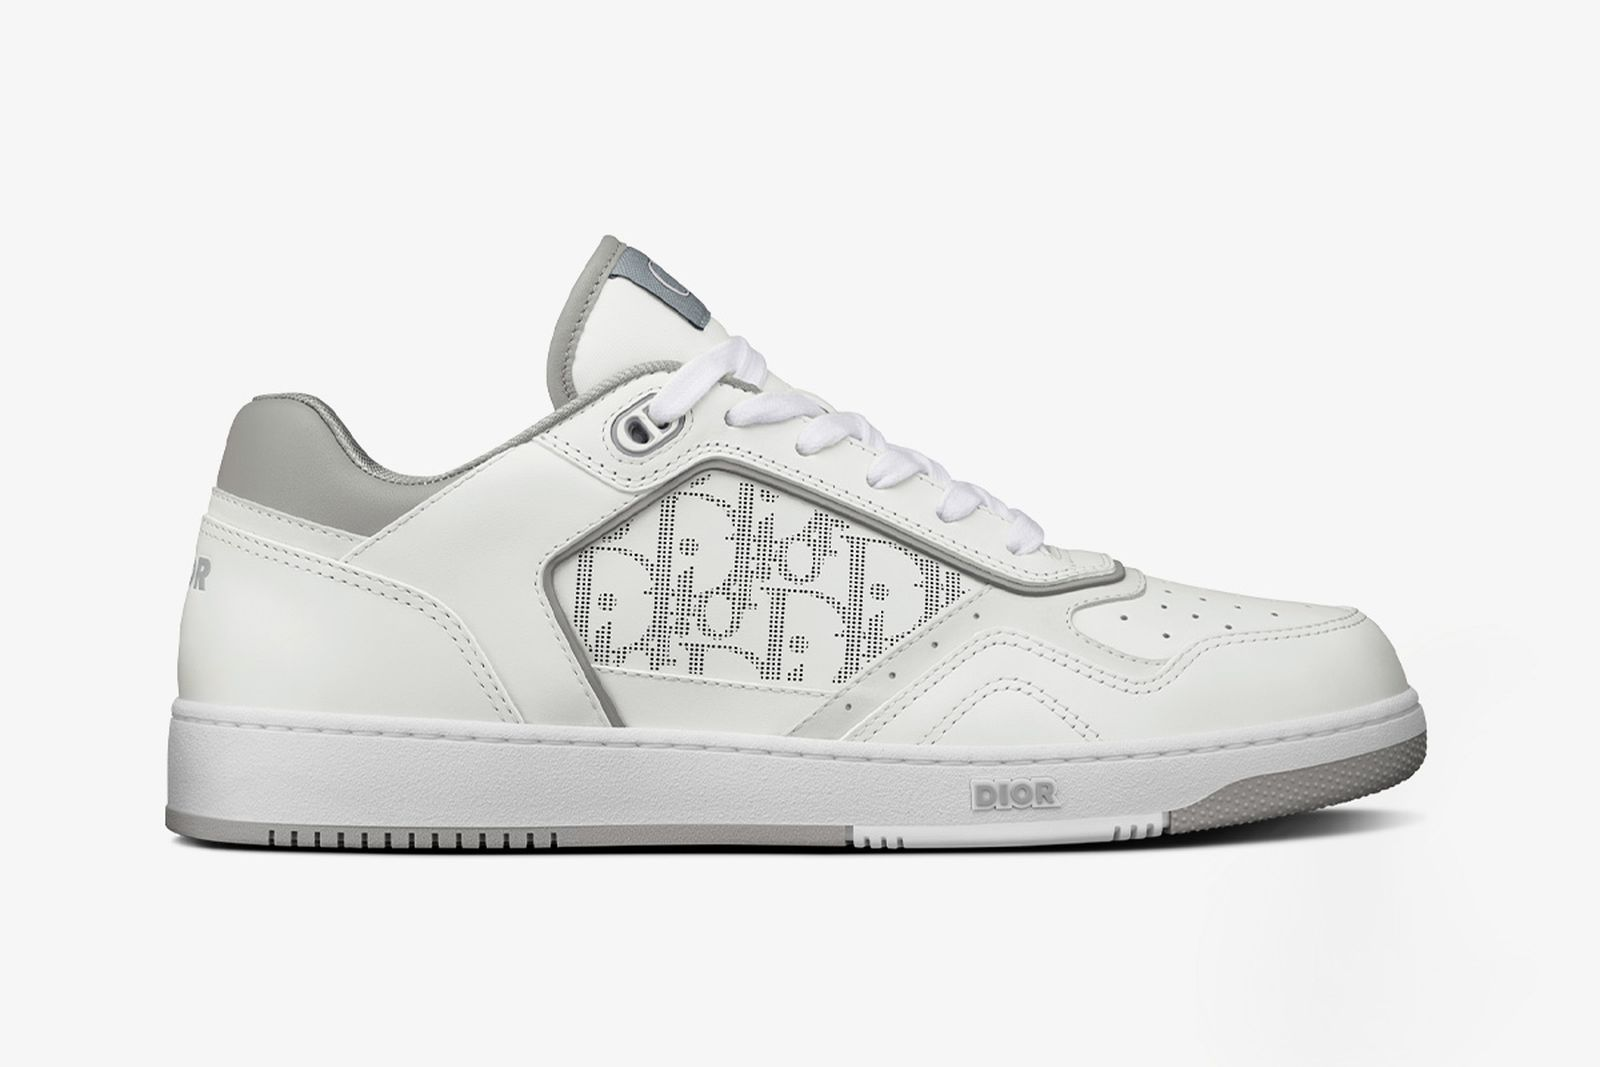 dior-b27-sneaker-release-date-price-04